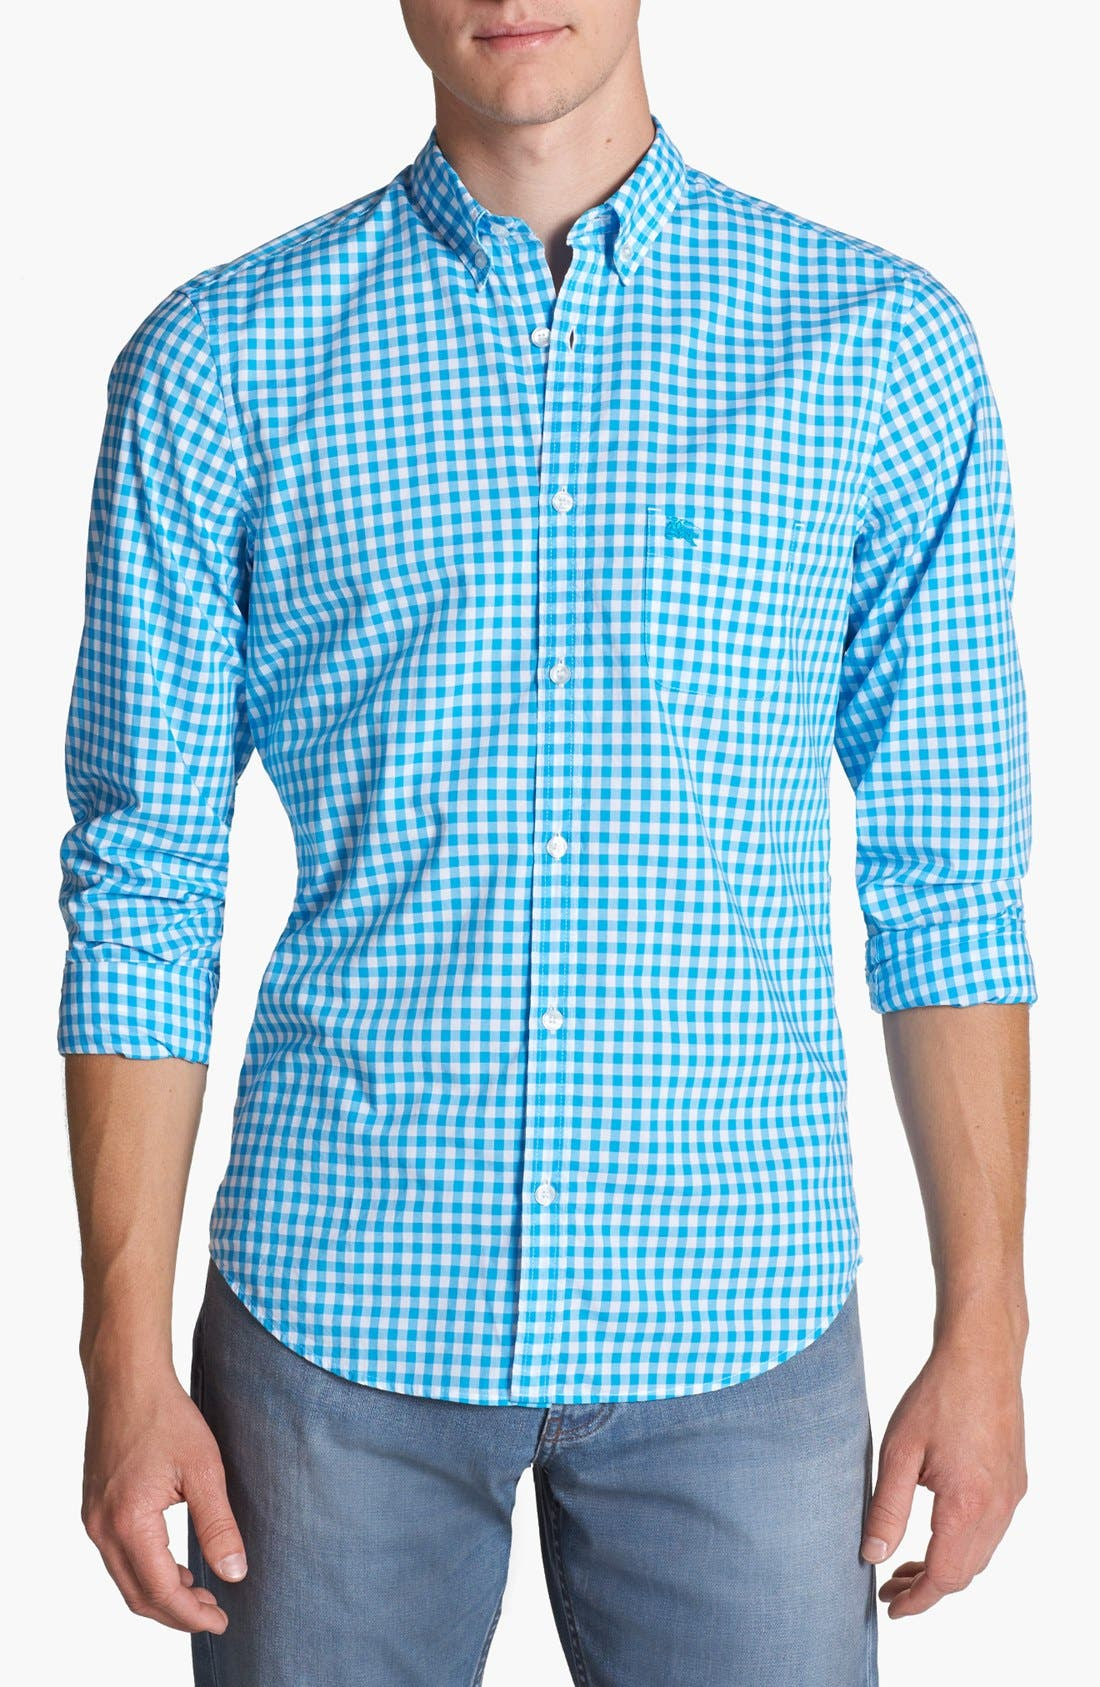 Alternate Image 1 Selected - Burberry Brit 'Adken' Gingham Trim Fit Cotton Sport Shirt